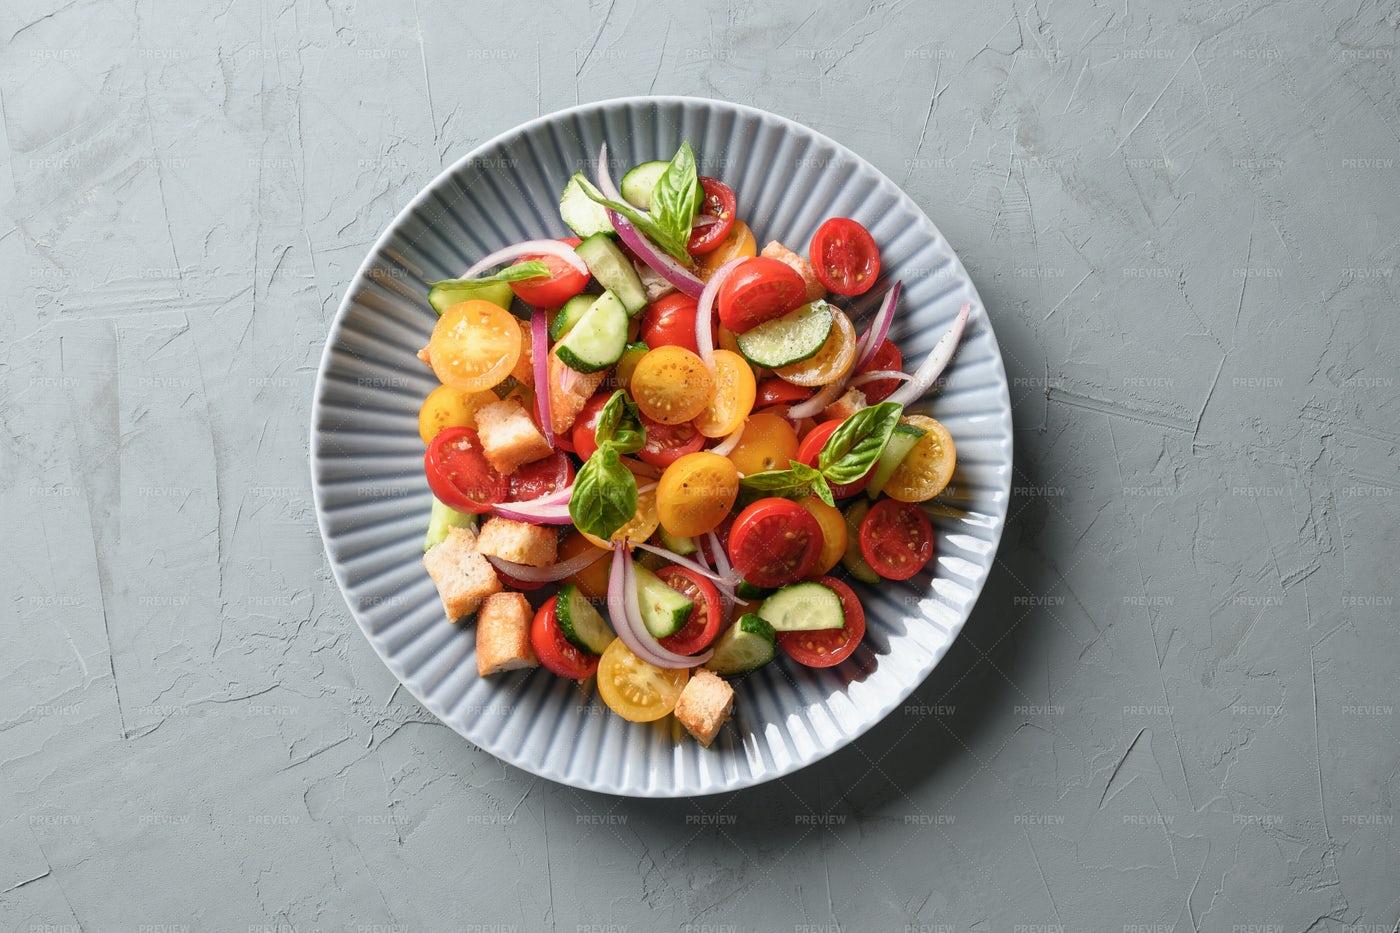 Tuscan Panzanella With Tomatoes: Stock Photos